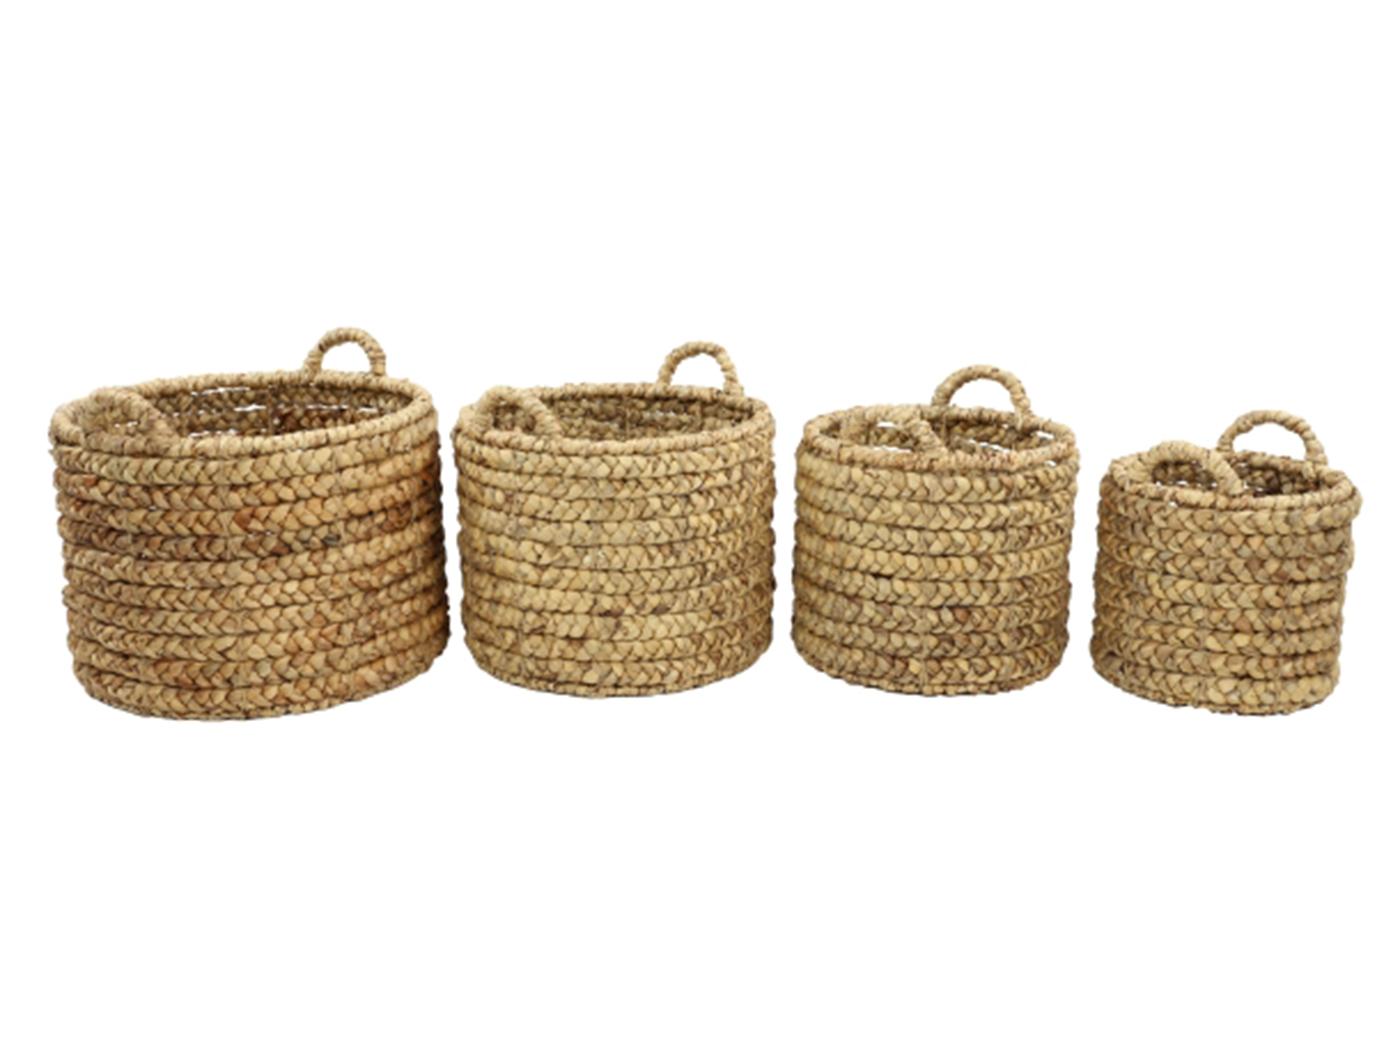 Set Of 4 Water Hyacinth Baskets 11 Quot 13 Quot 15 Quot 17 Quot W Steinhafels